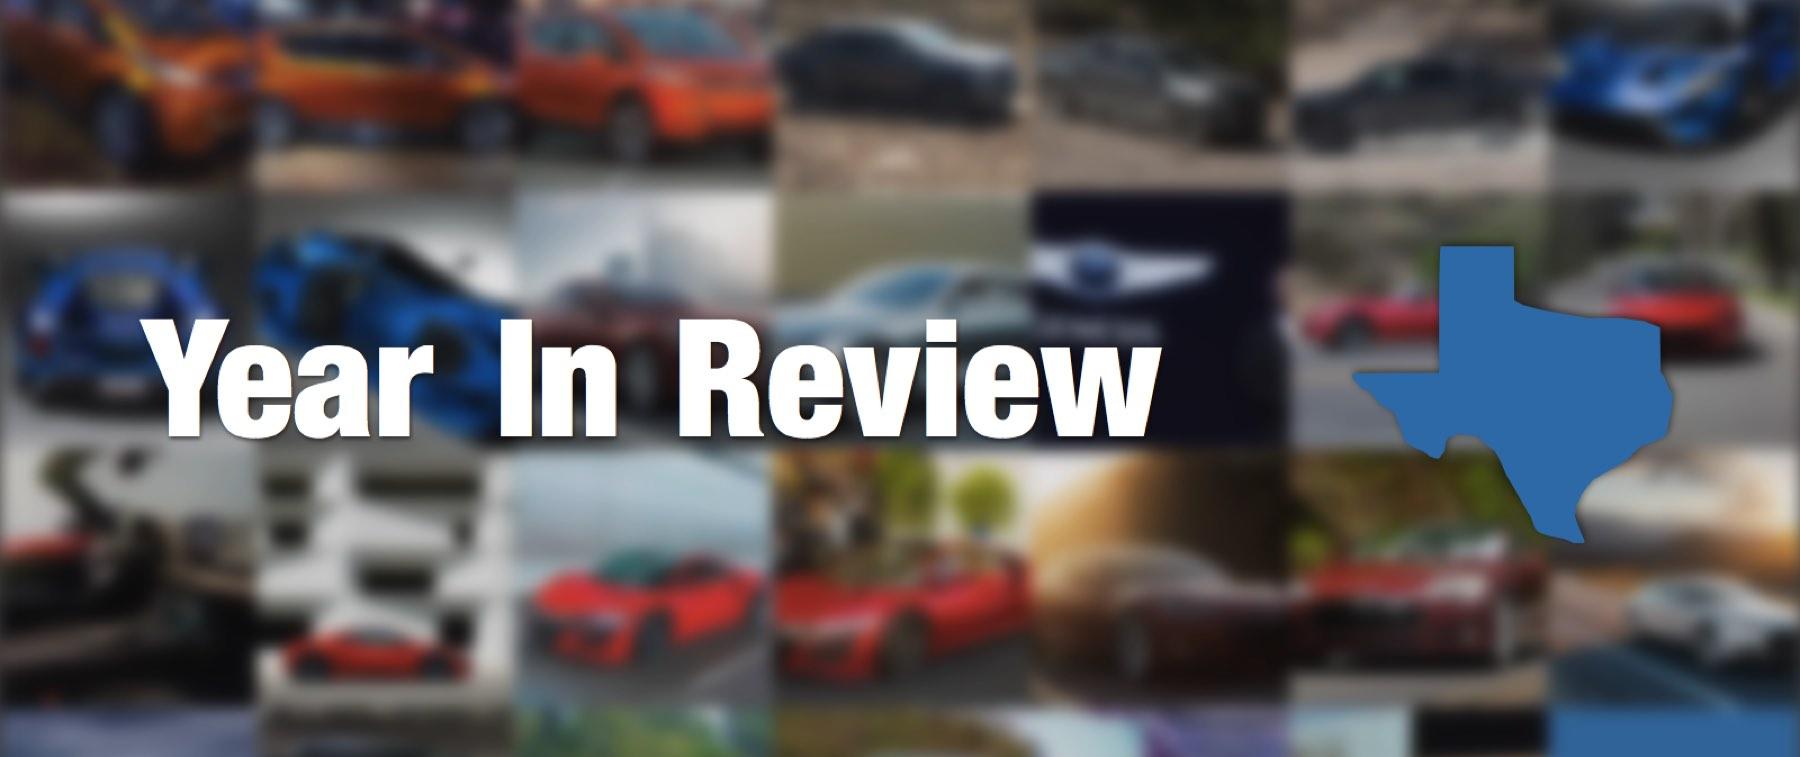 txGarage-Year-In-Review-1600×673-txGarage